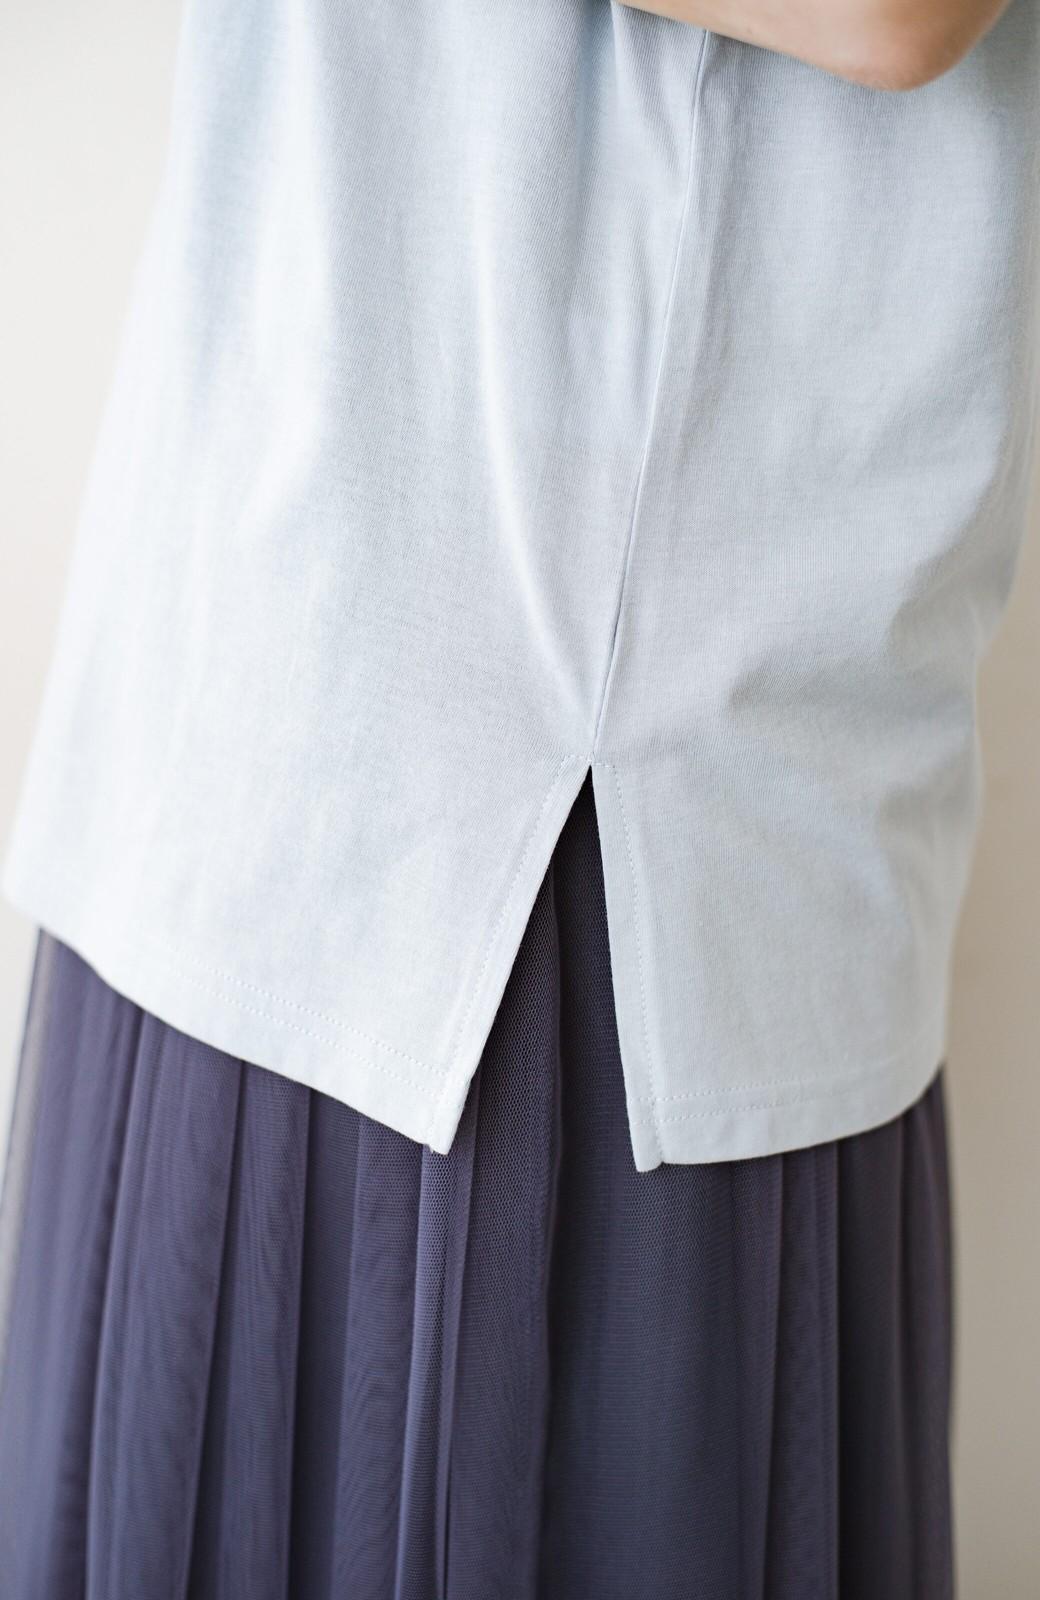 haco! 汗染み軽減加工で安心!1枚でも重ね着にも便利なシンプルTシャツ by ZAMPA <サックスブルー>の商品写真3